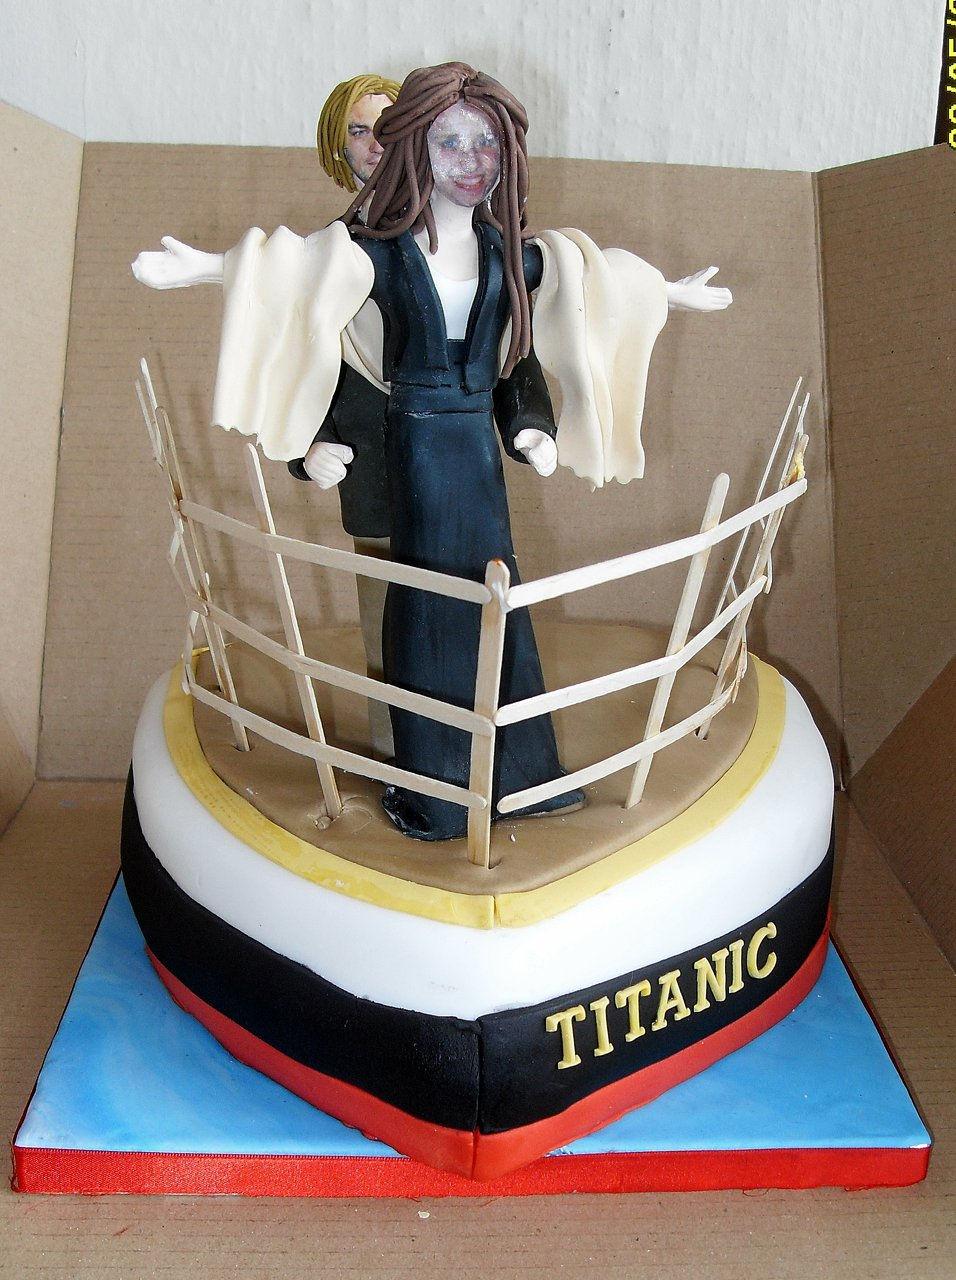 Titanic Edible Birthday Cake Topper